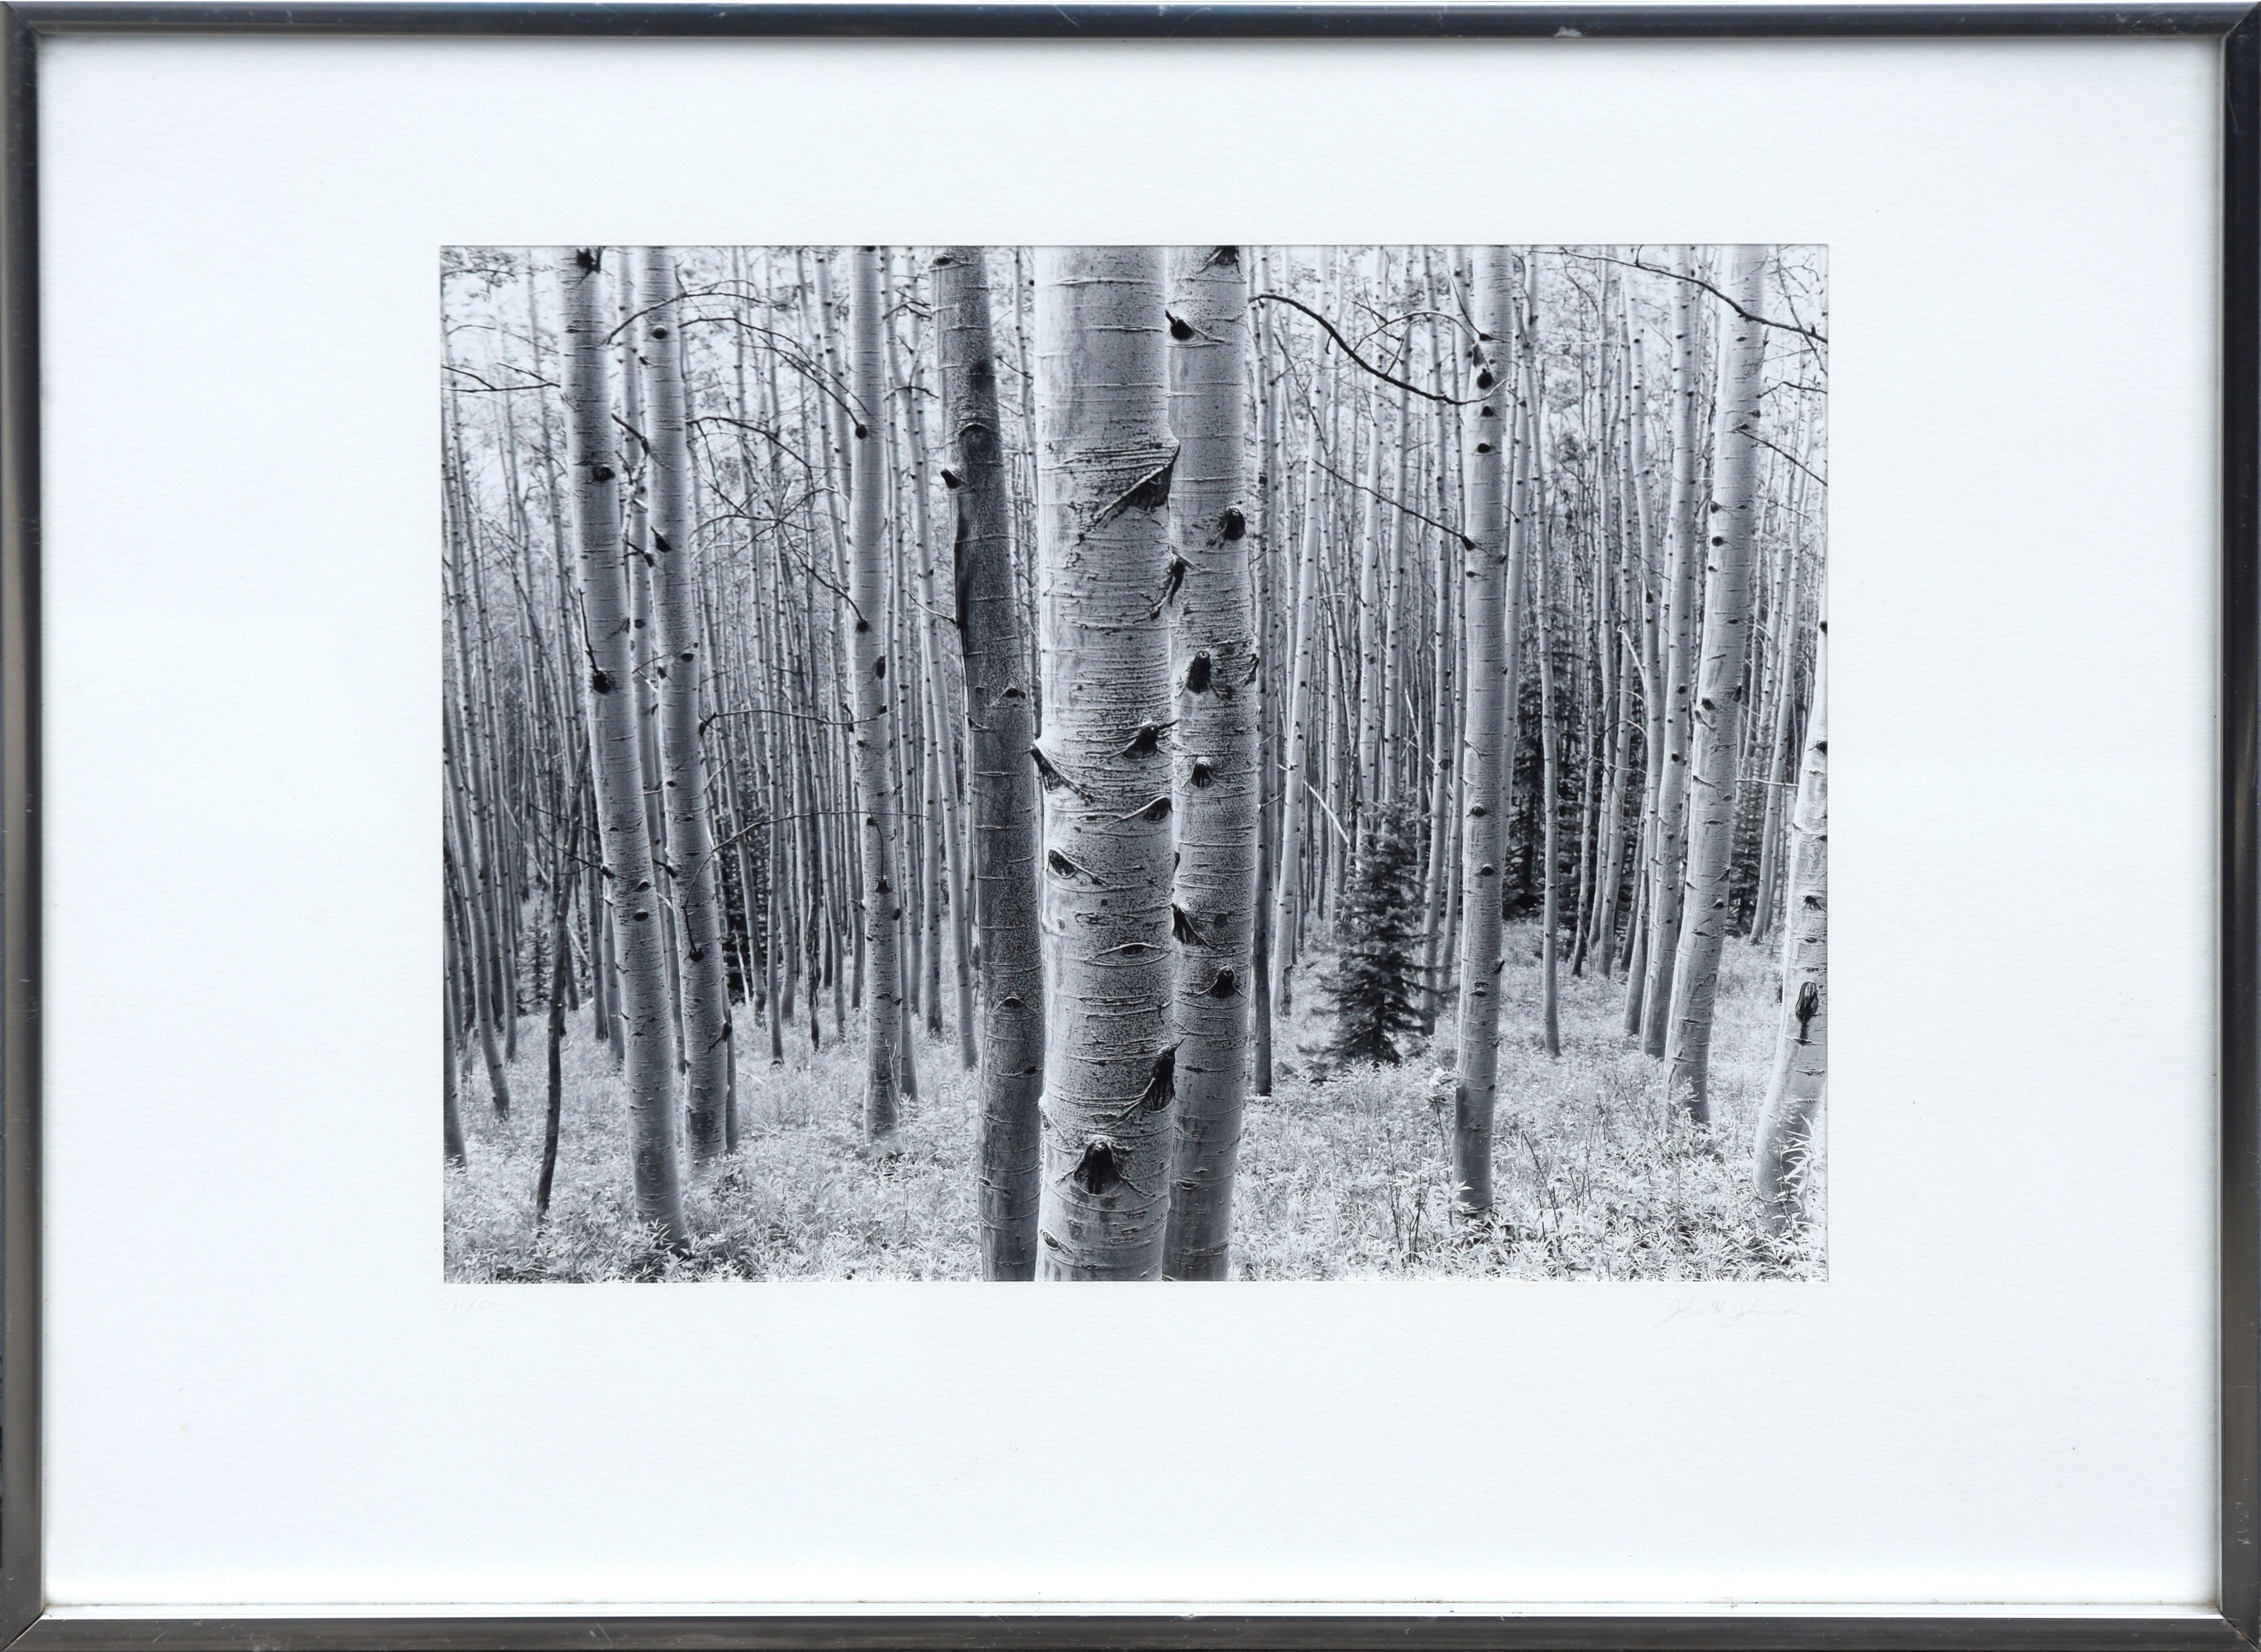 Aspen Grove Forest - Black & White Landscape Photograph